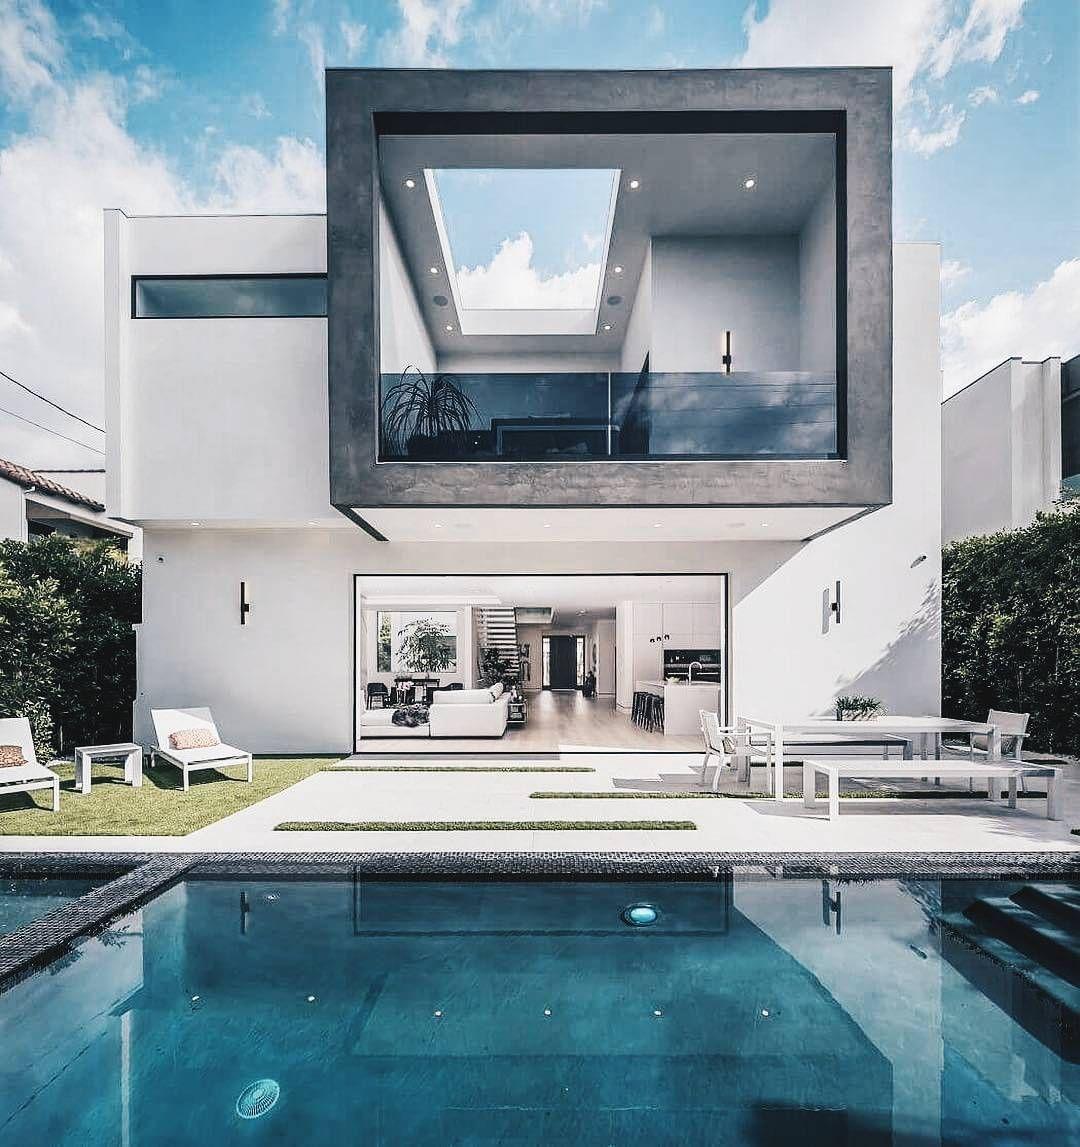 Pin von Teresa Vaz auf Moradias | Pinterest | Moderne villa ...